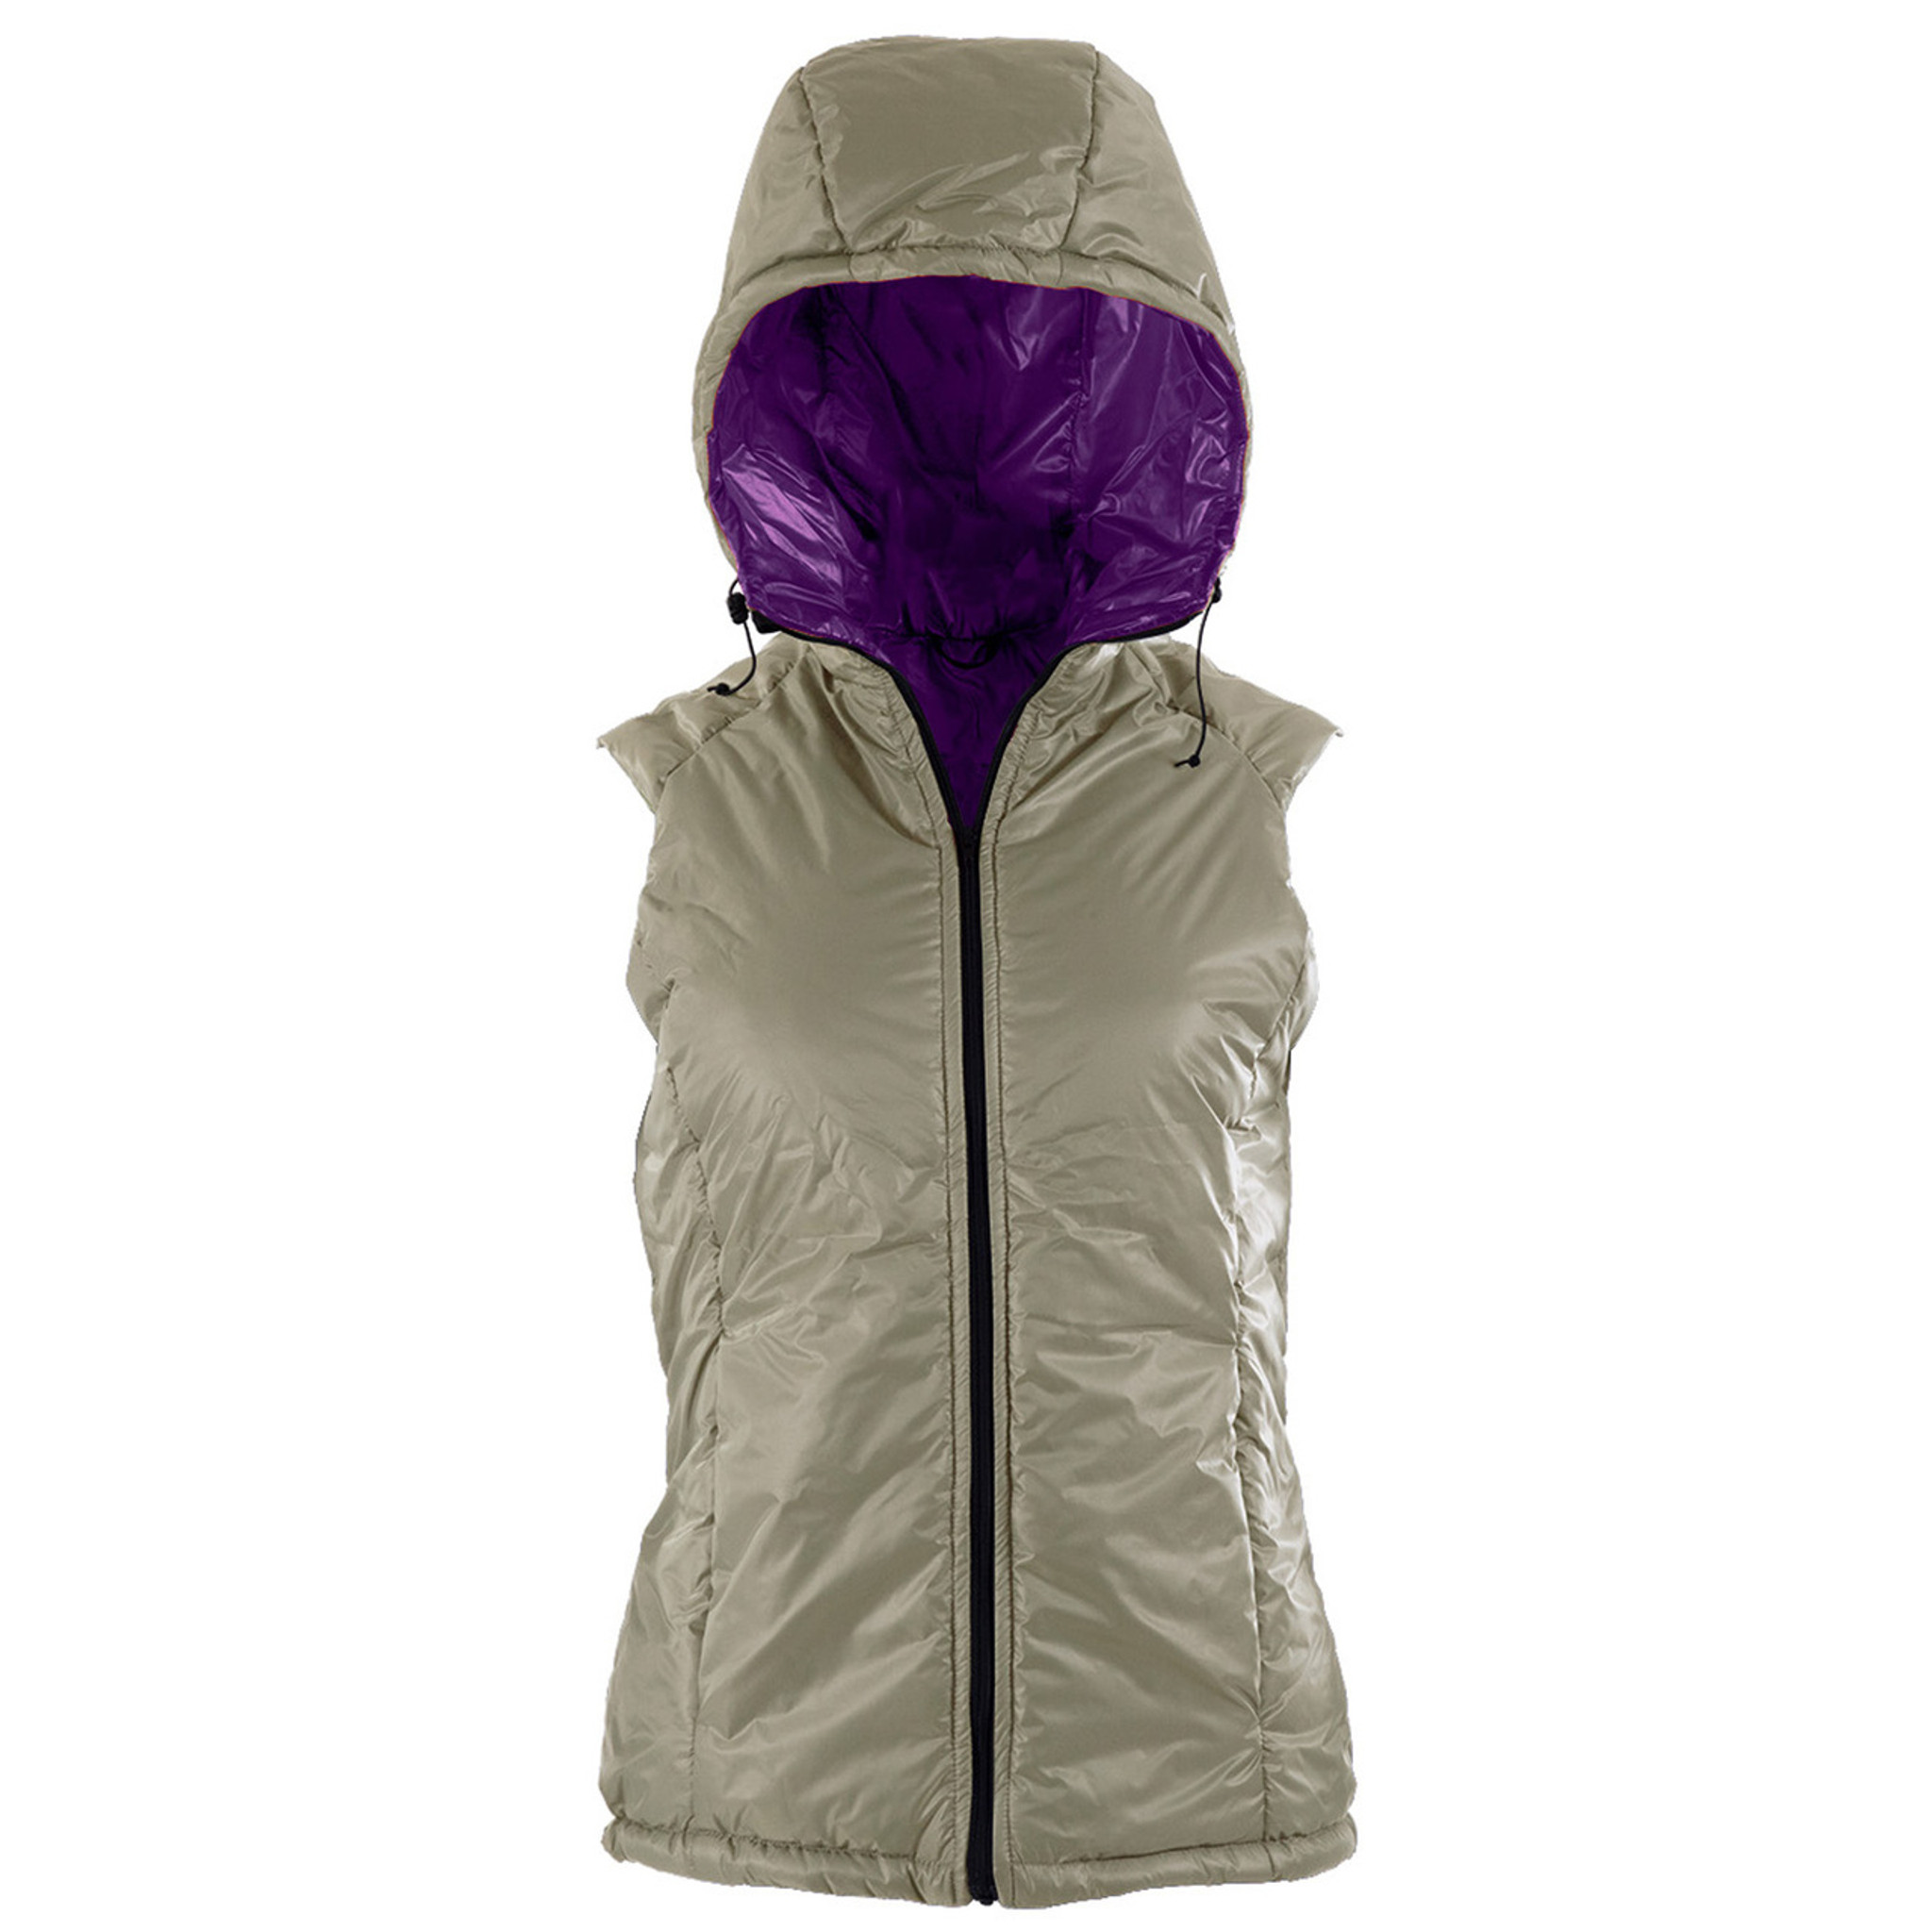 381f19babd5 Torrid APEX Women s Vest